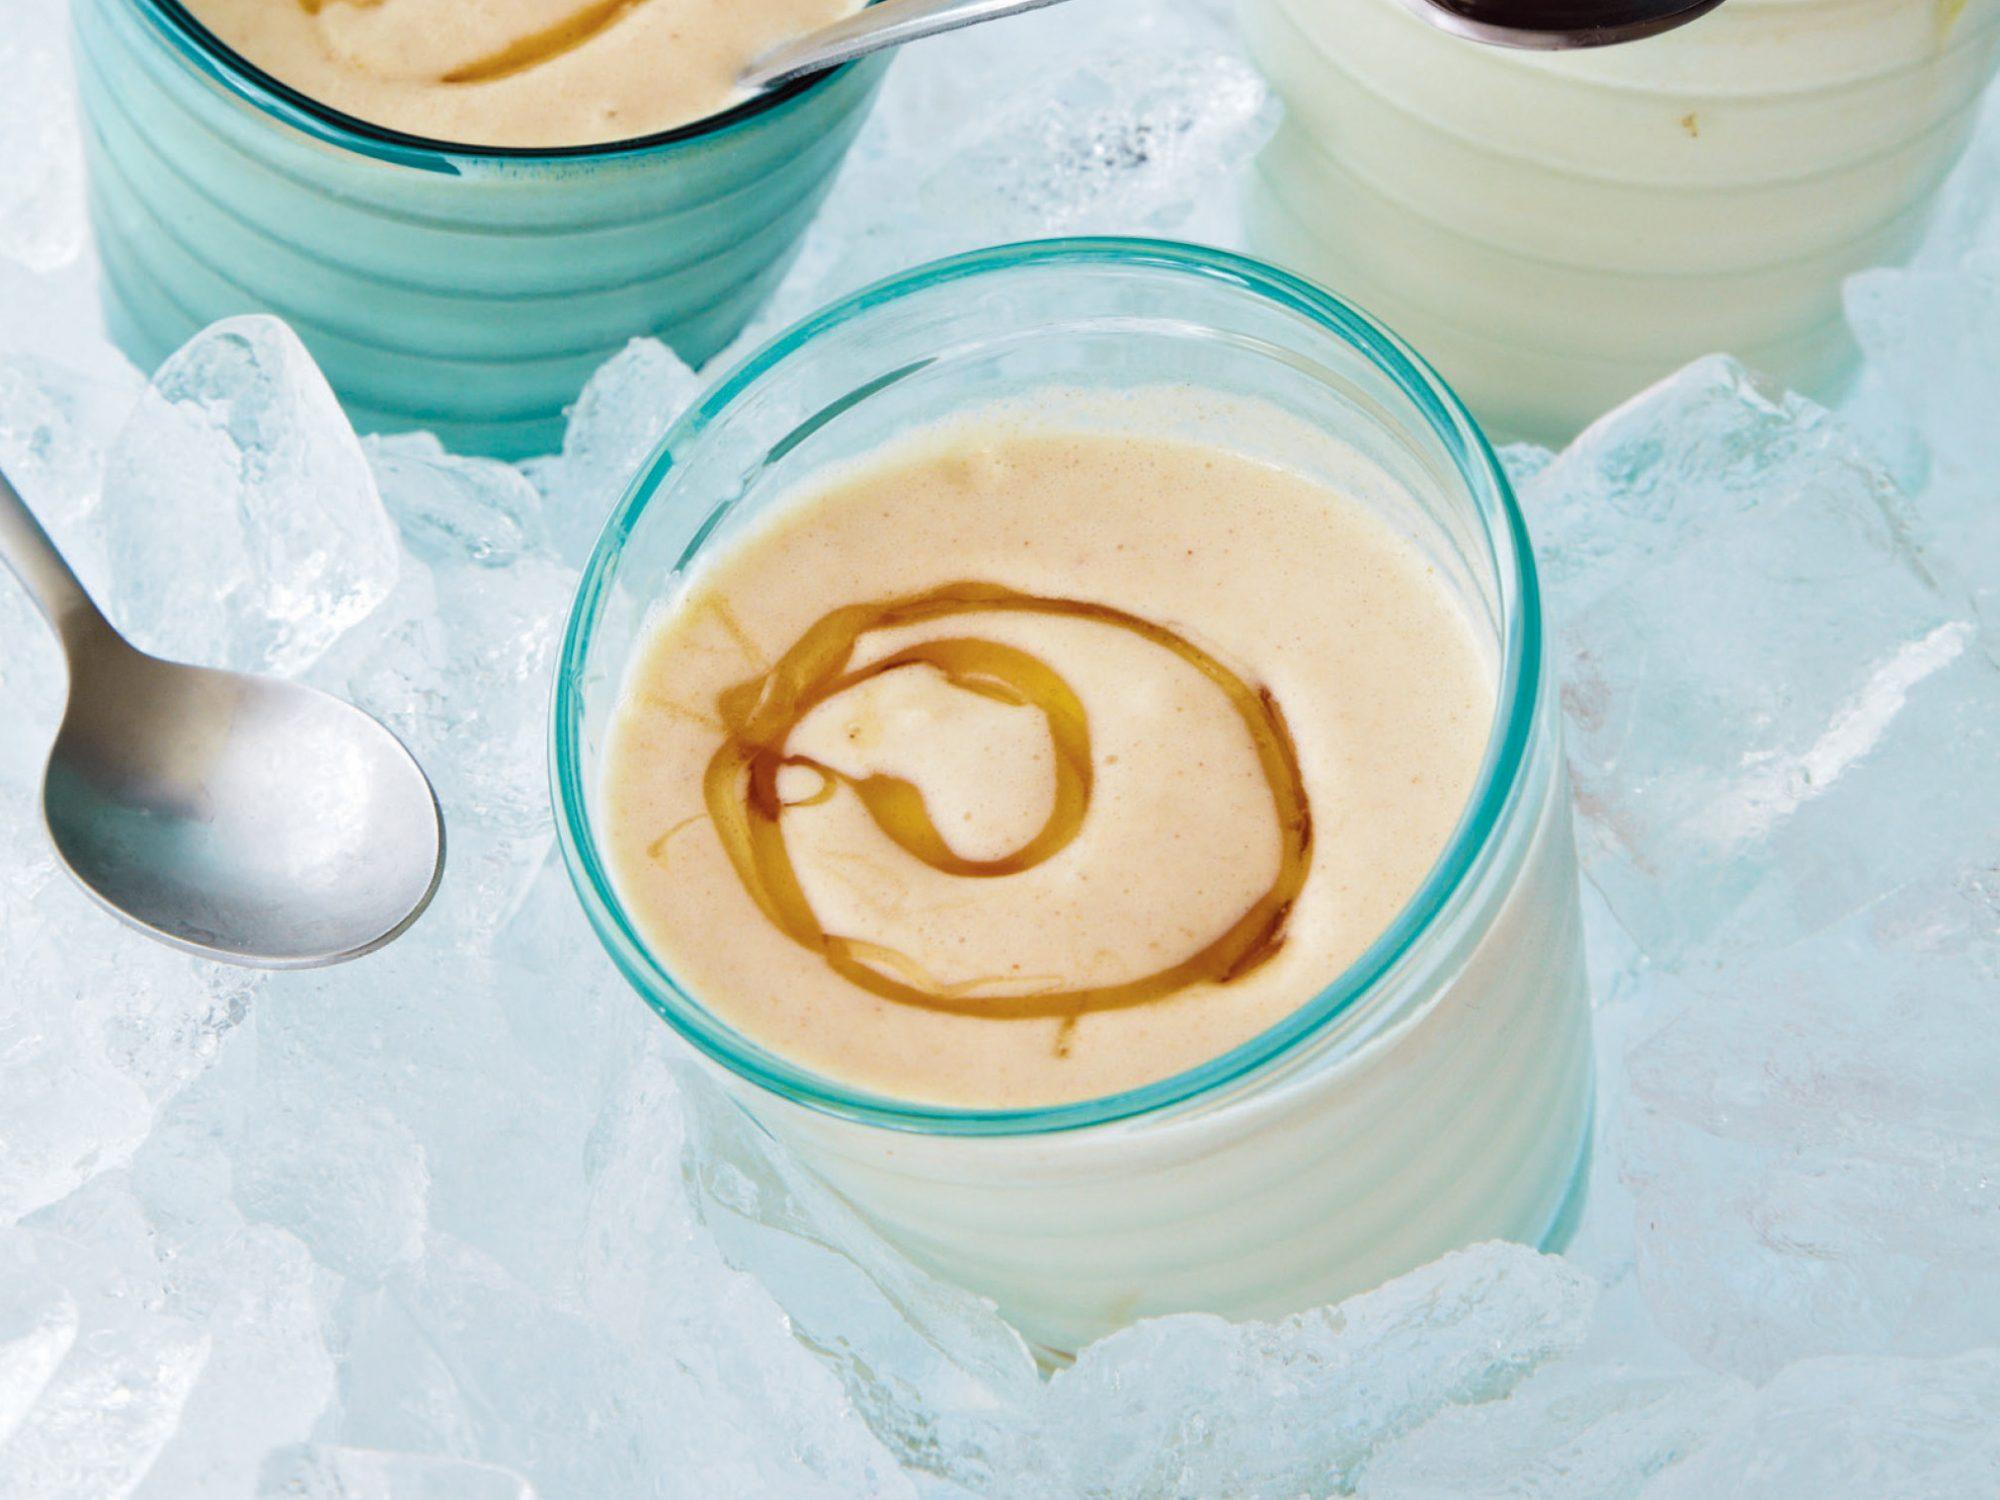 Honey-Peanut Butter Shake